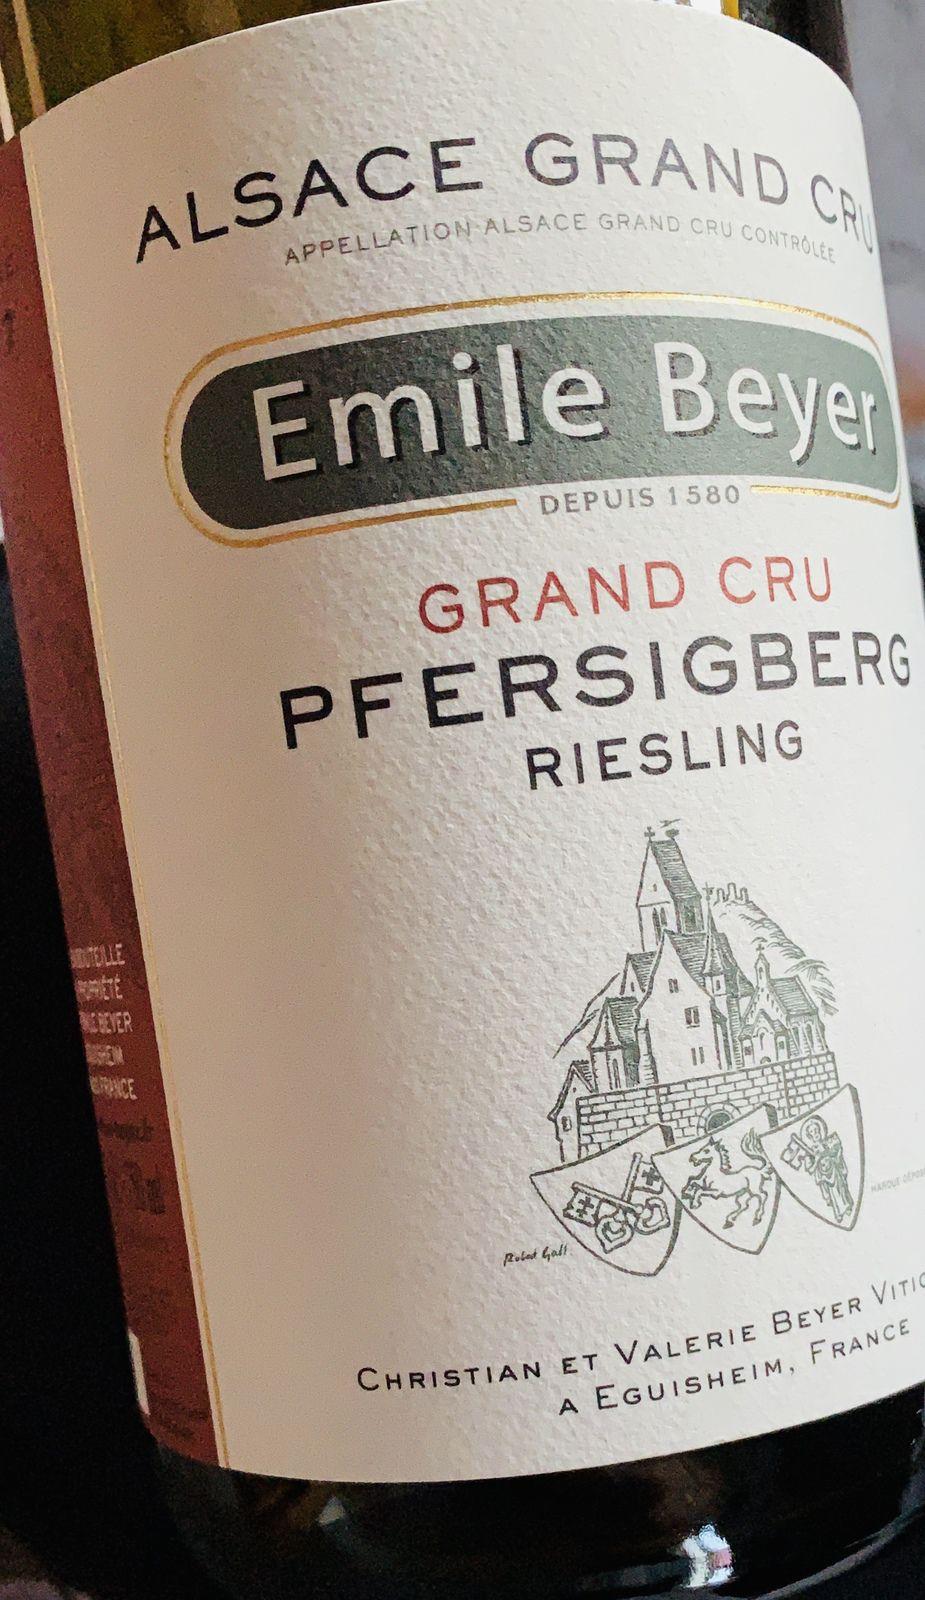 Alsace Grand Cru Pfersigberg riesling 2017 Émile Beyer